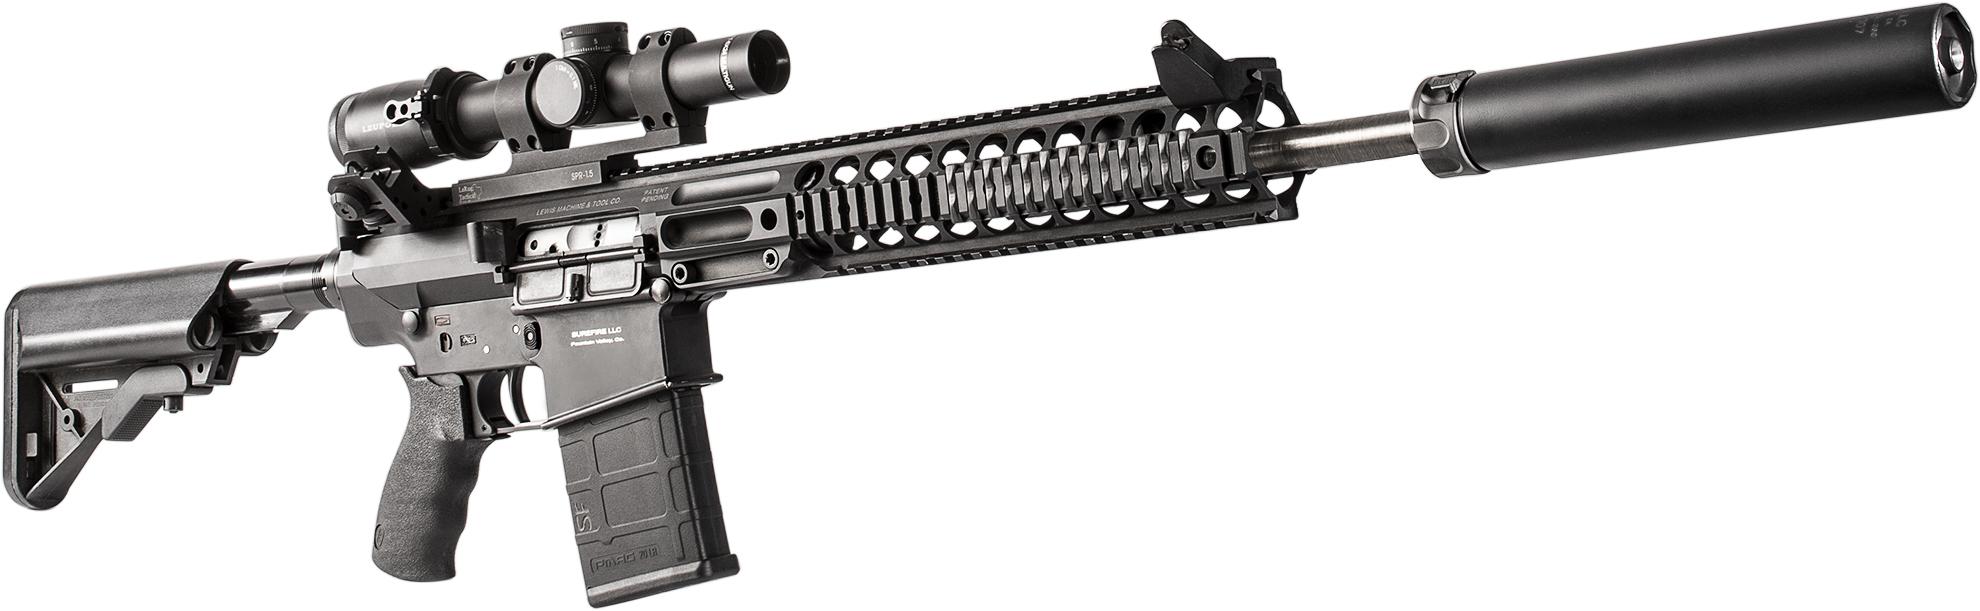 SureFire SOCOM260-RC2 suppressor mounted on a 6.5 Creedmor AR-variant rifle